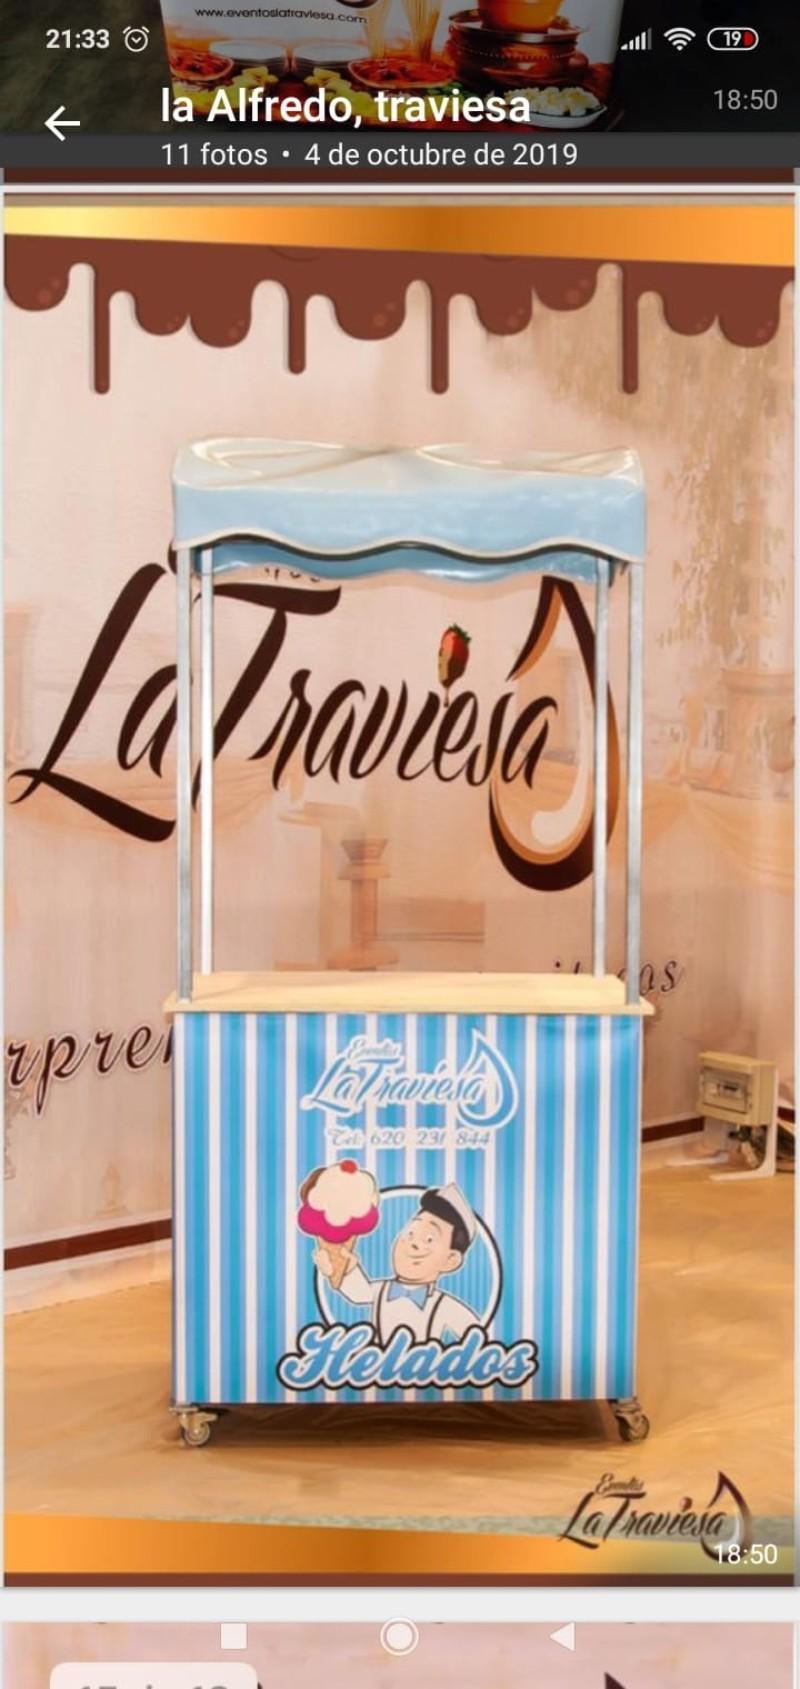 Carro helado artesanos